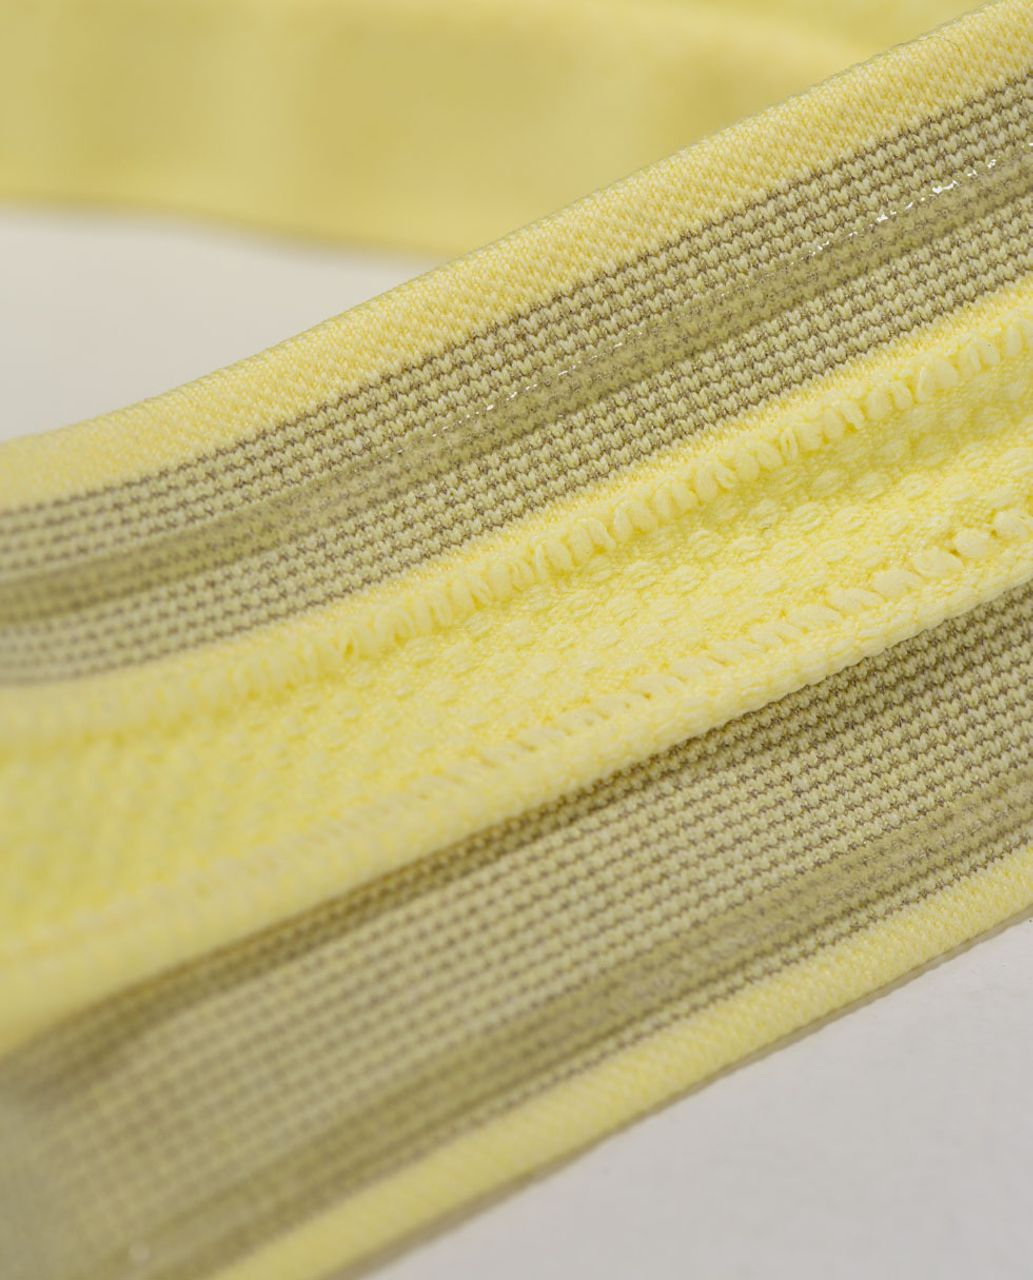 Lululemon Swiftly Headband - Heathered Mellow Lemon